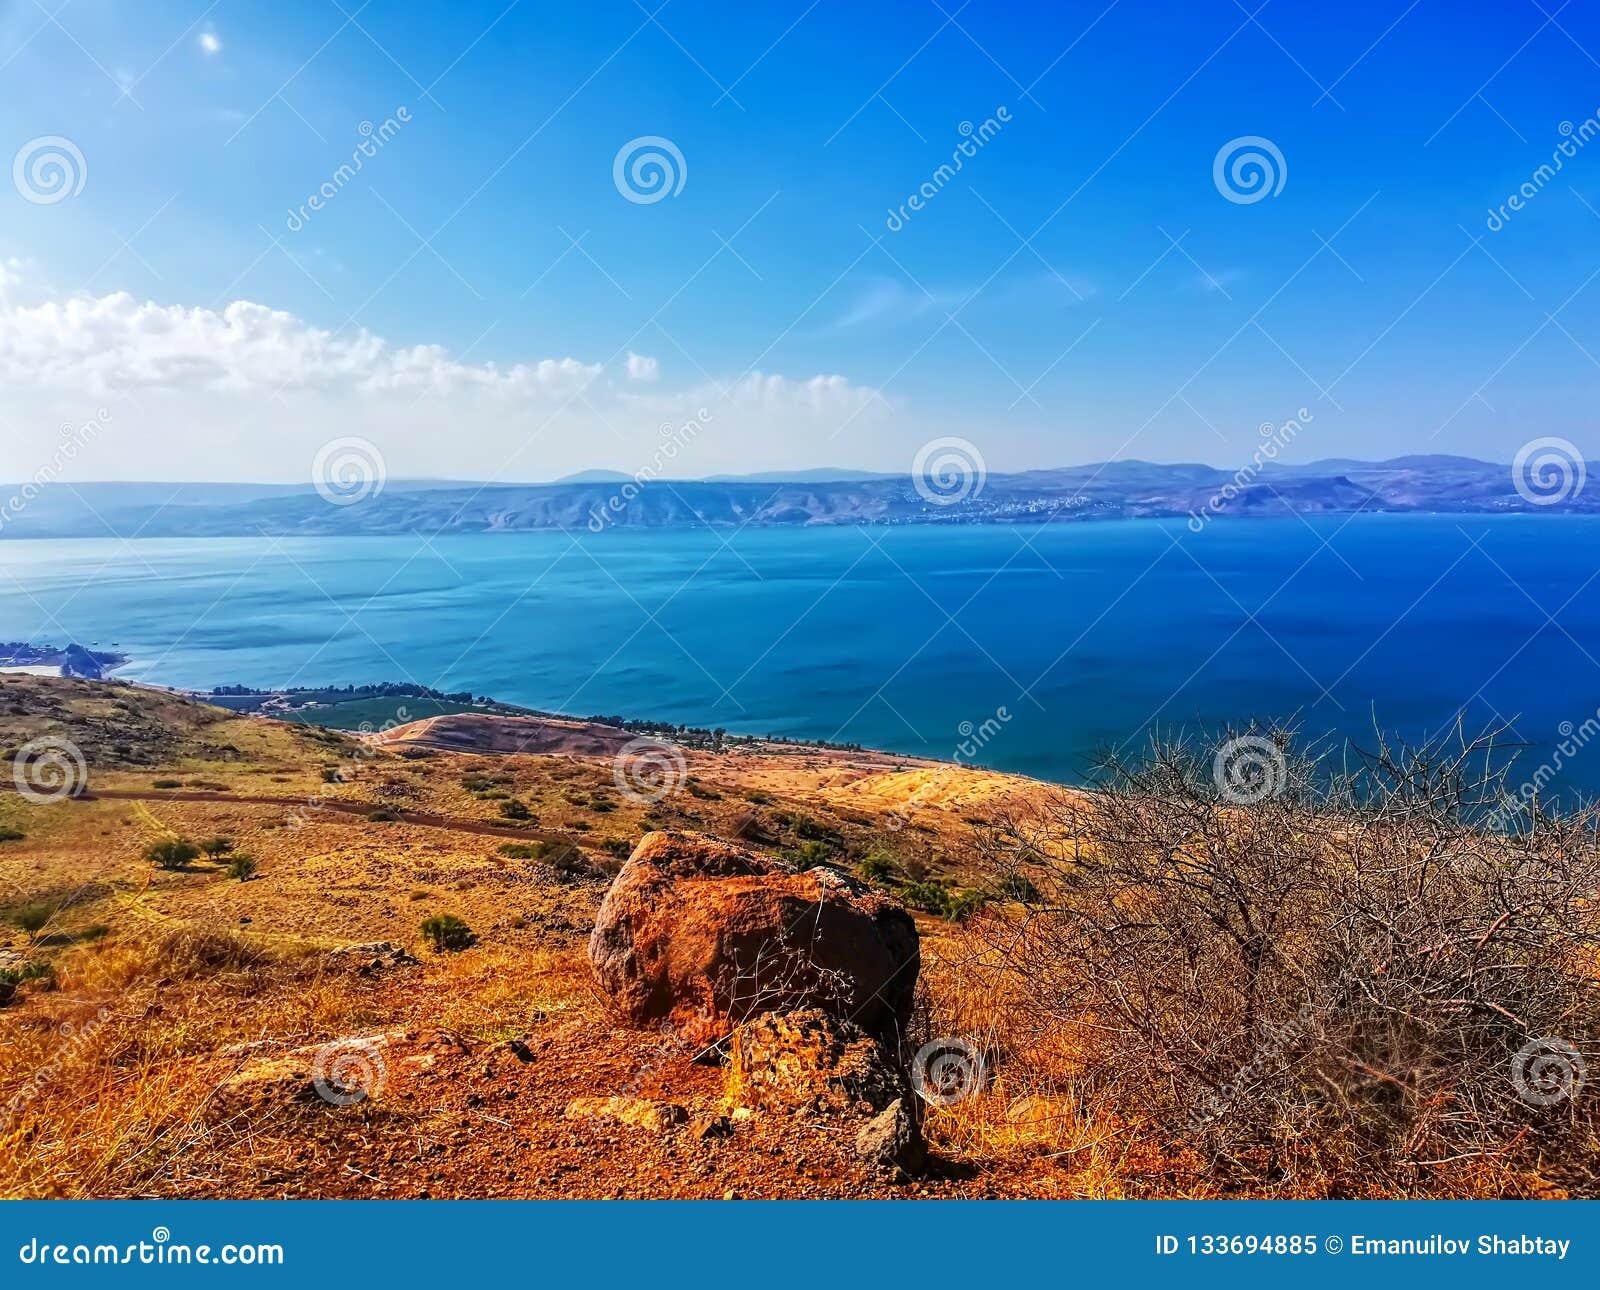 Region In Israel: Jordan Rift Valley, Golan Heights, Galilee  Sea Of